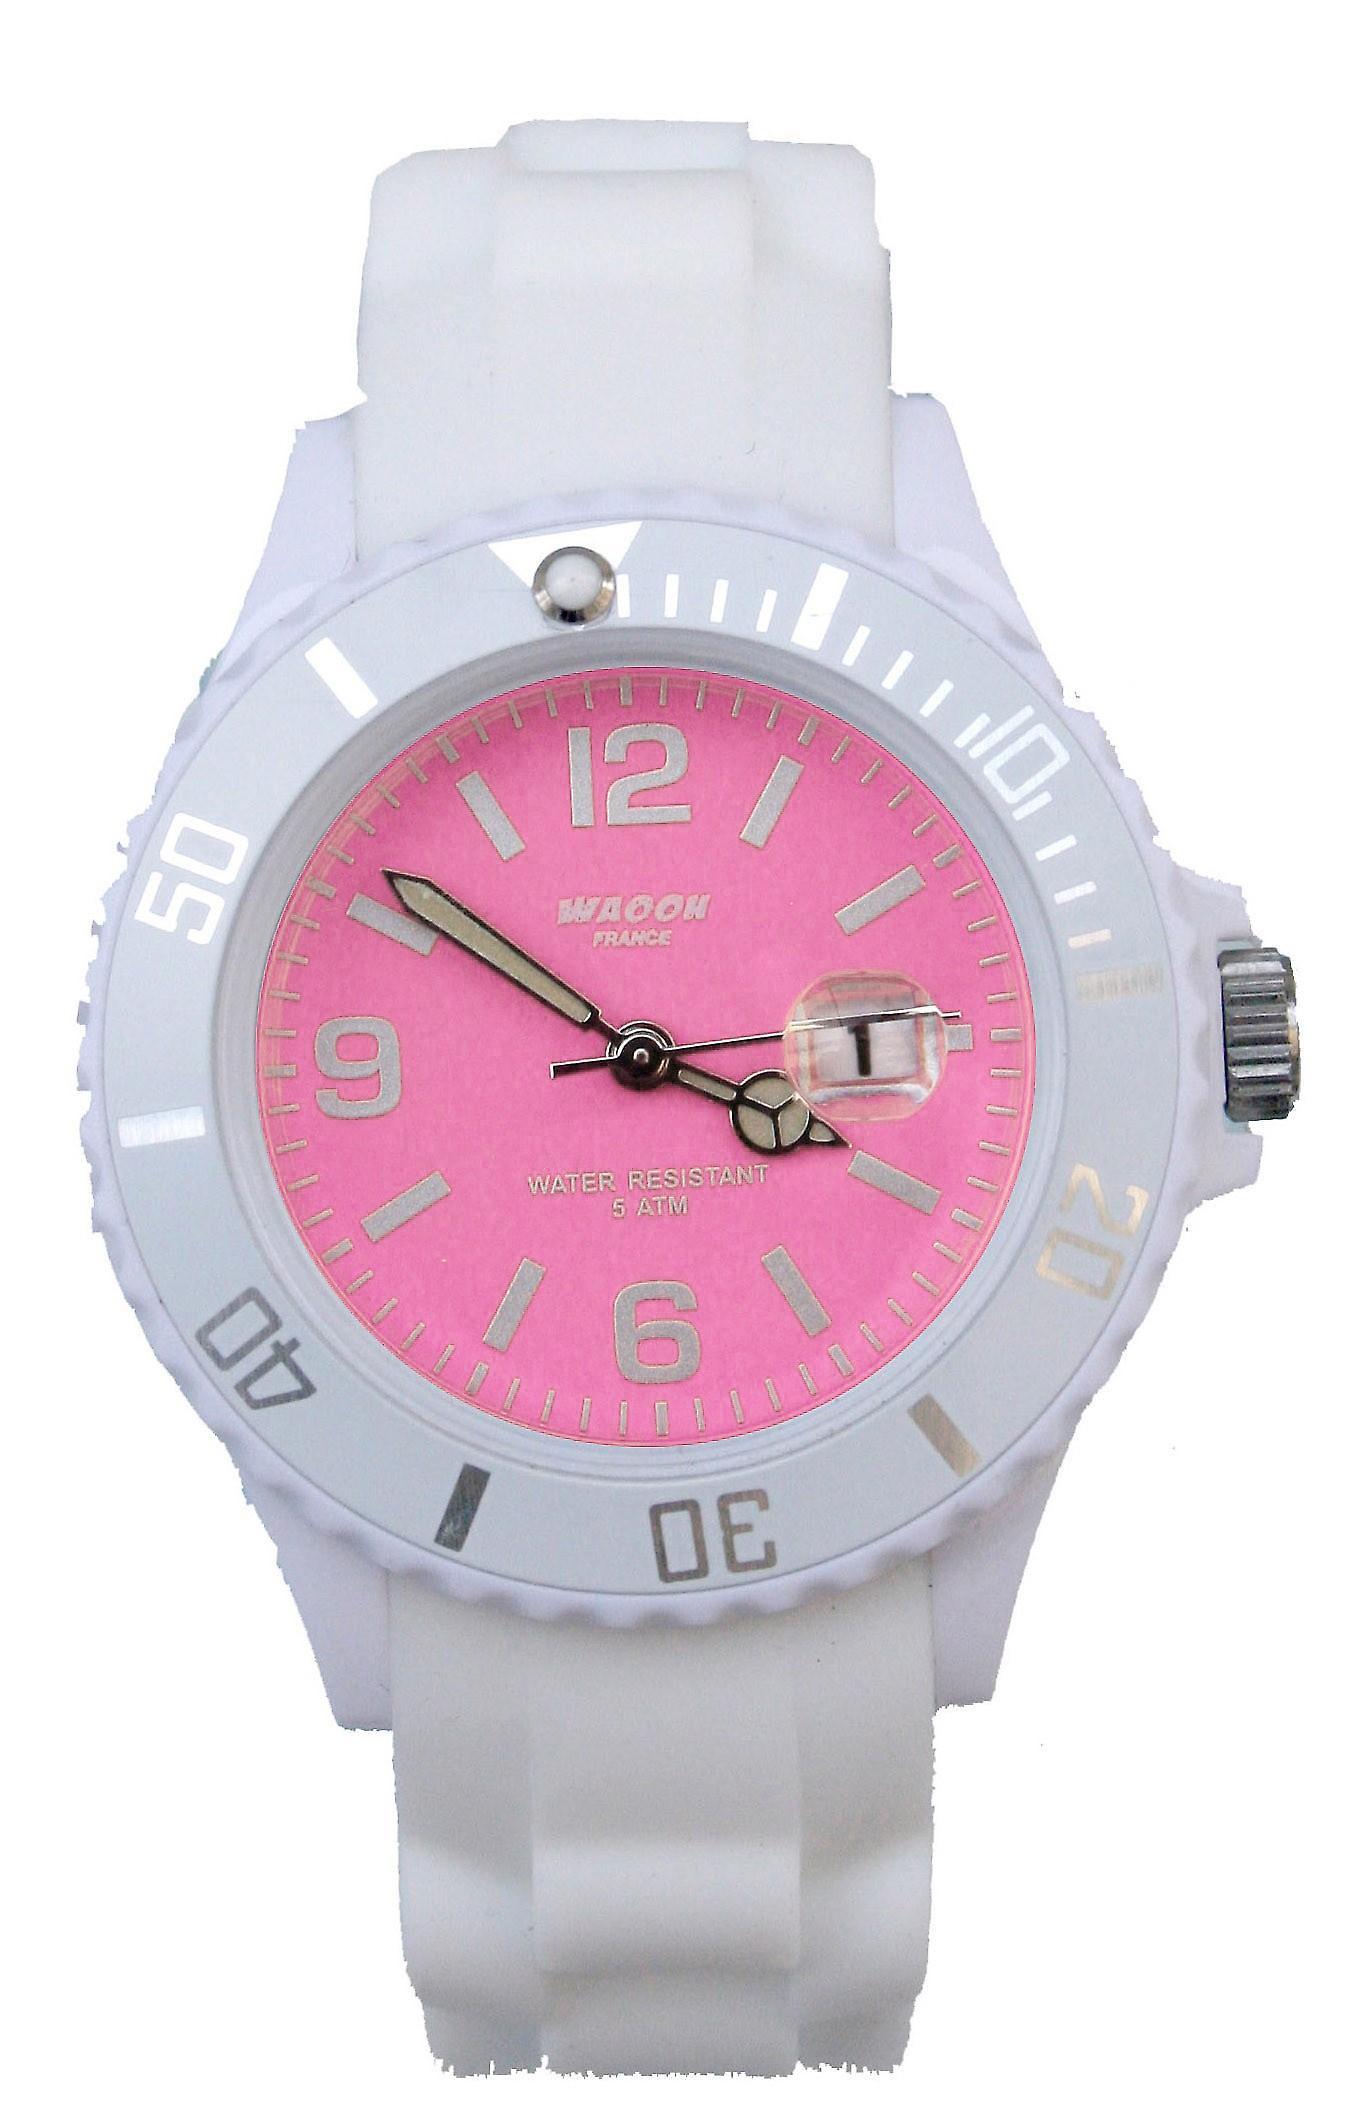 Waooh - Watch MONACO 38 White Dial Color